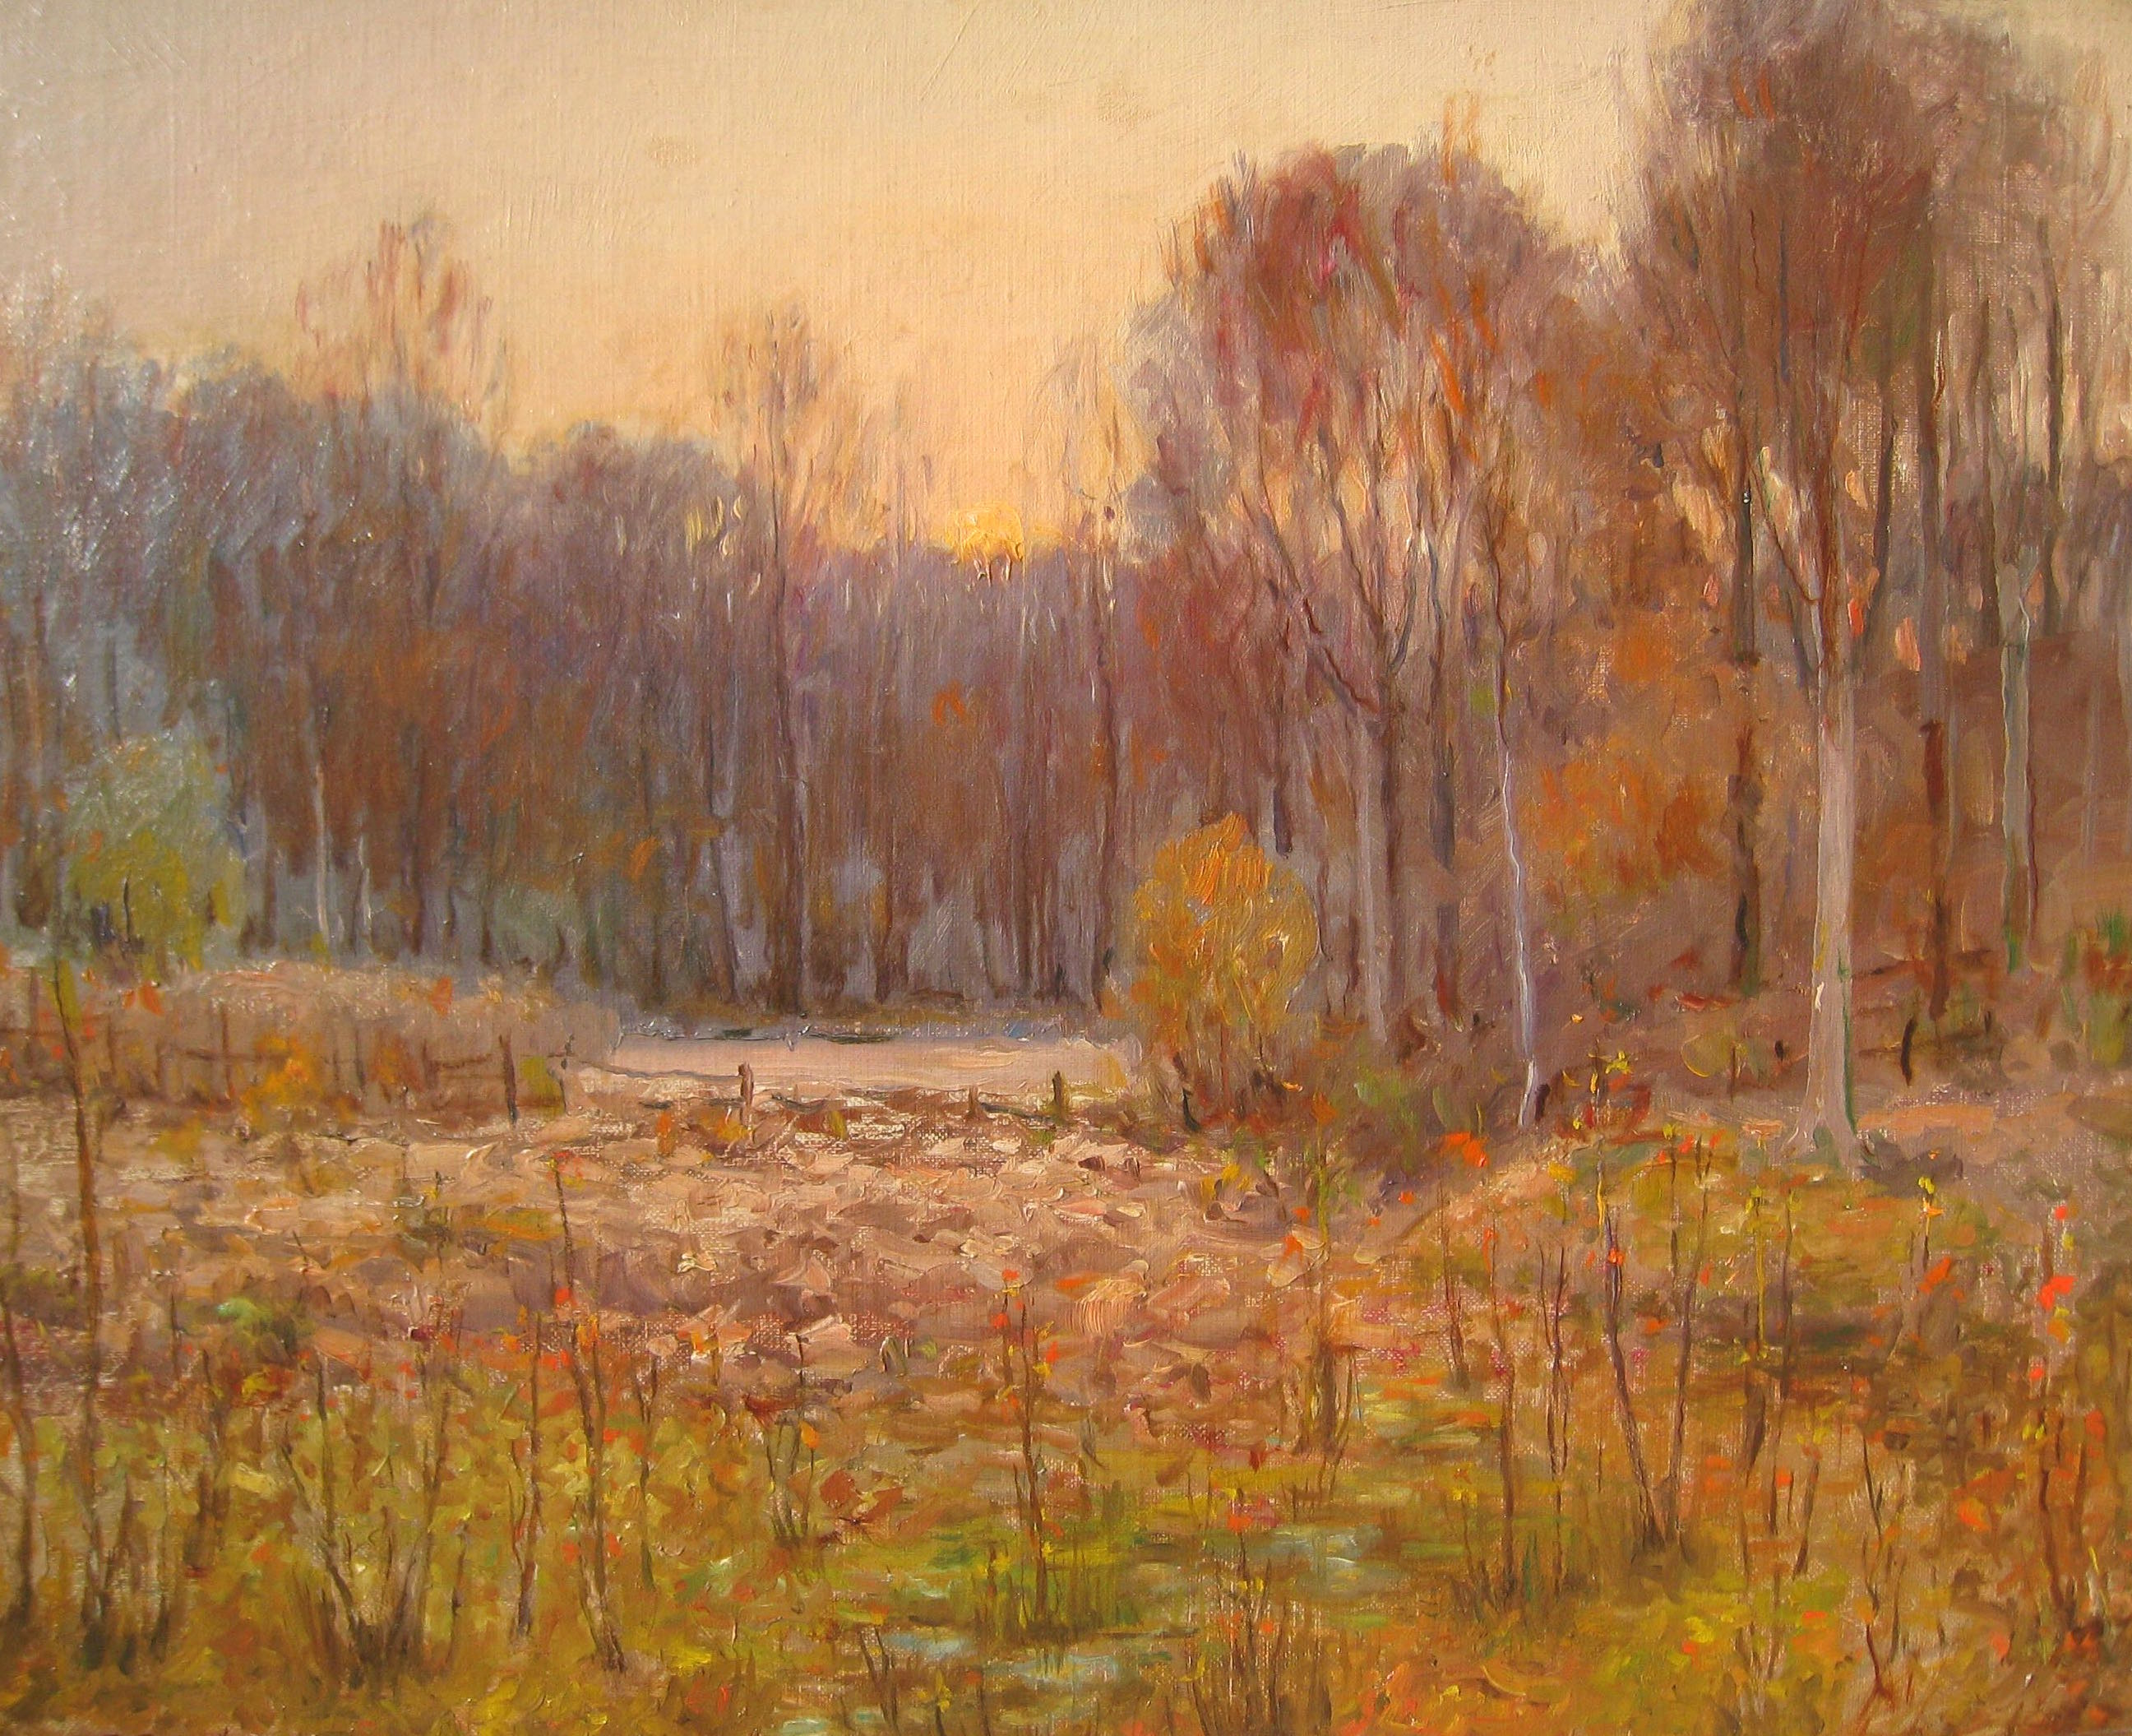 bundy-autumnsunrise-cropped1a